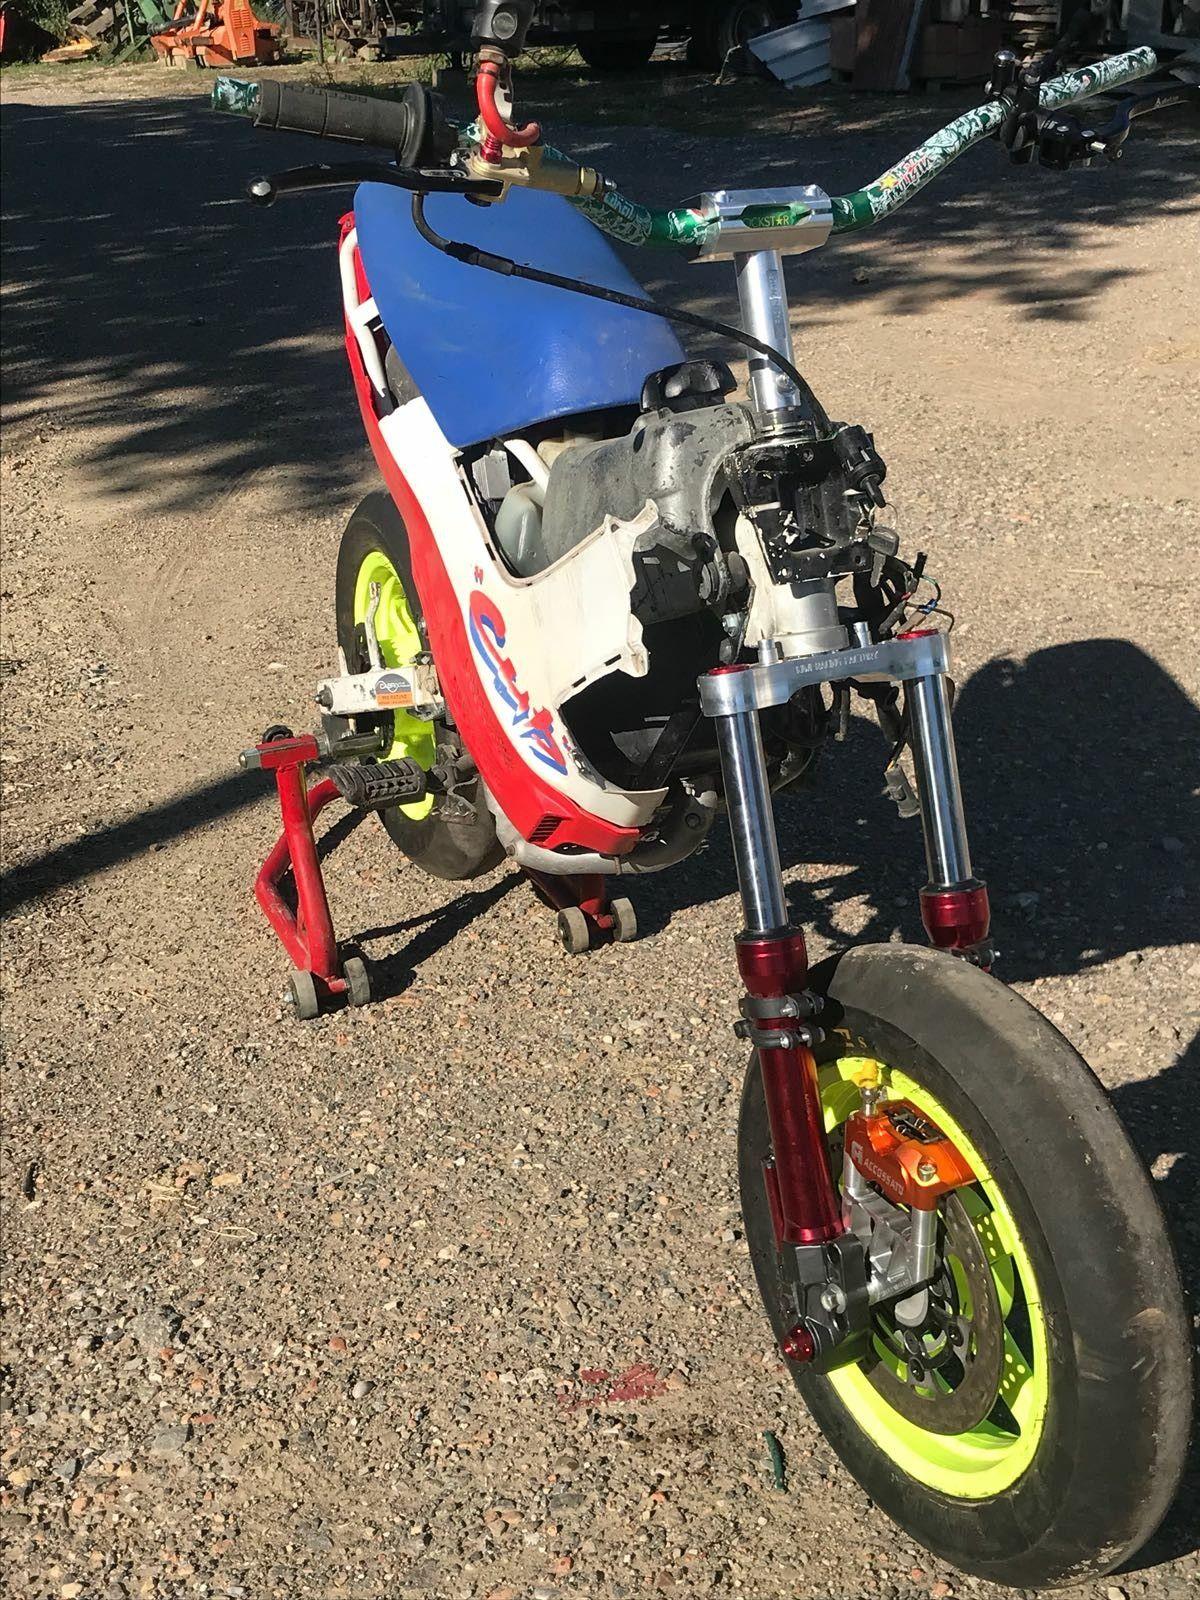 Pin de Leonardus Henky en Motorized Bikes (con imágenes